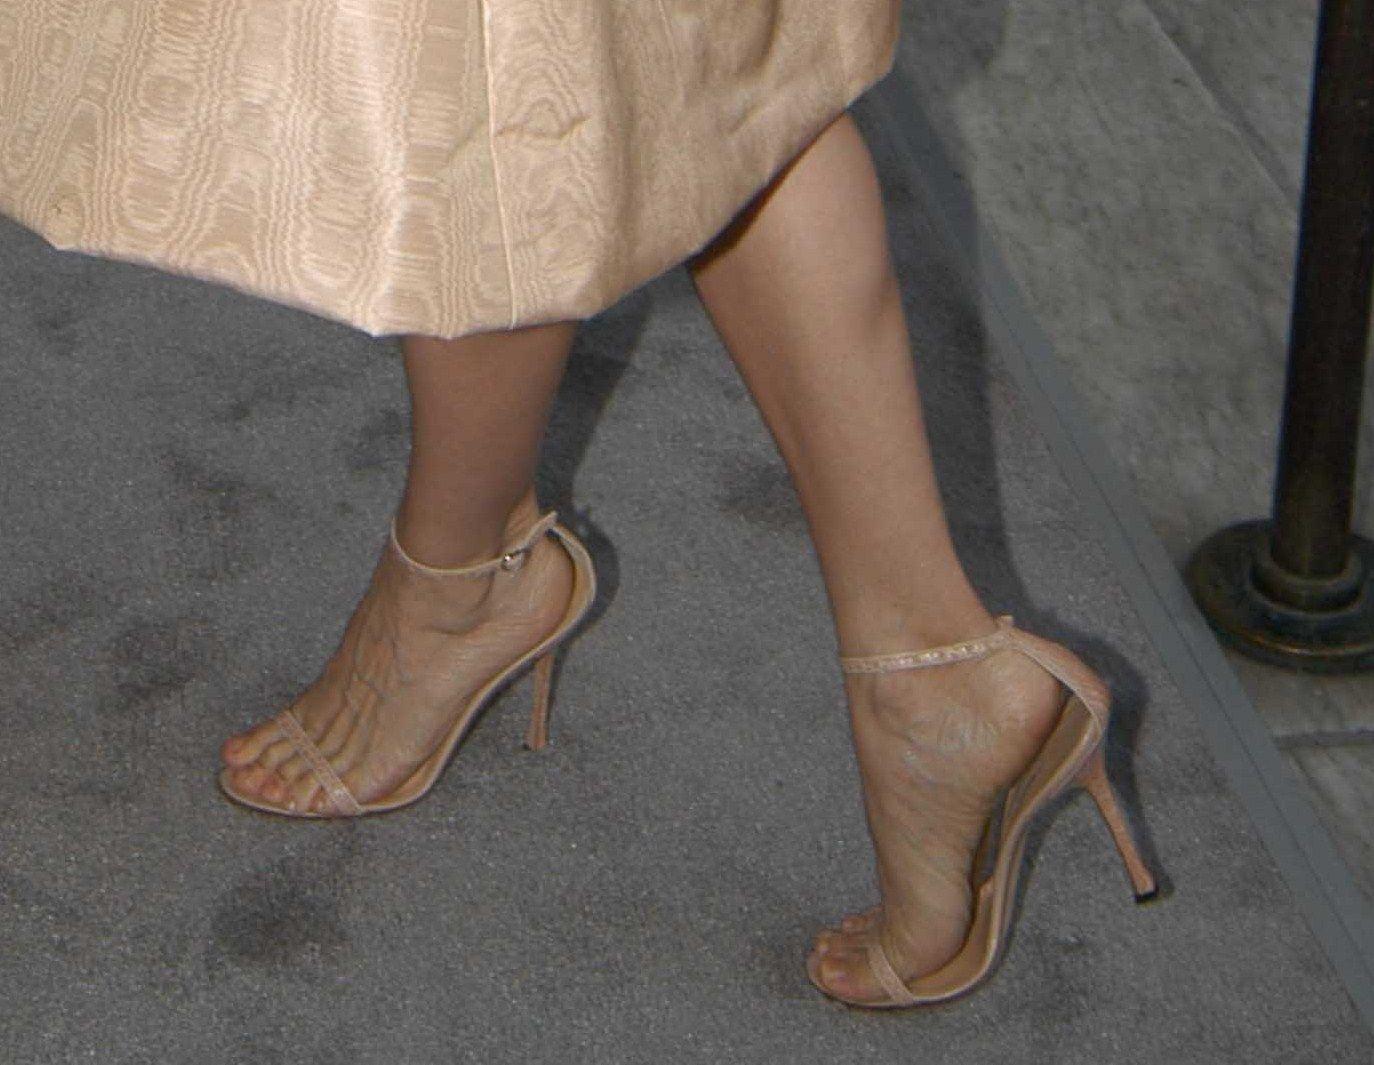 http://1.bp.blogspot.com/_hgdlBJDRZkM/TSyt1cWn8wI/AAAAAAAAGSI/vasygup4z9s/s1600/sarah-jessica-parker-feet-4.jpg